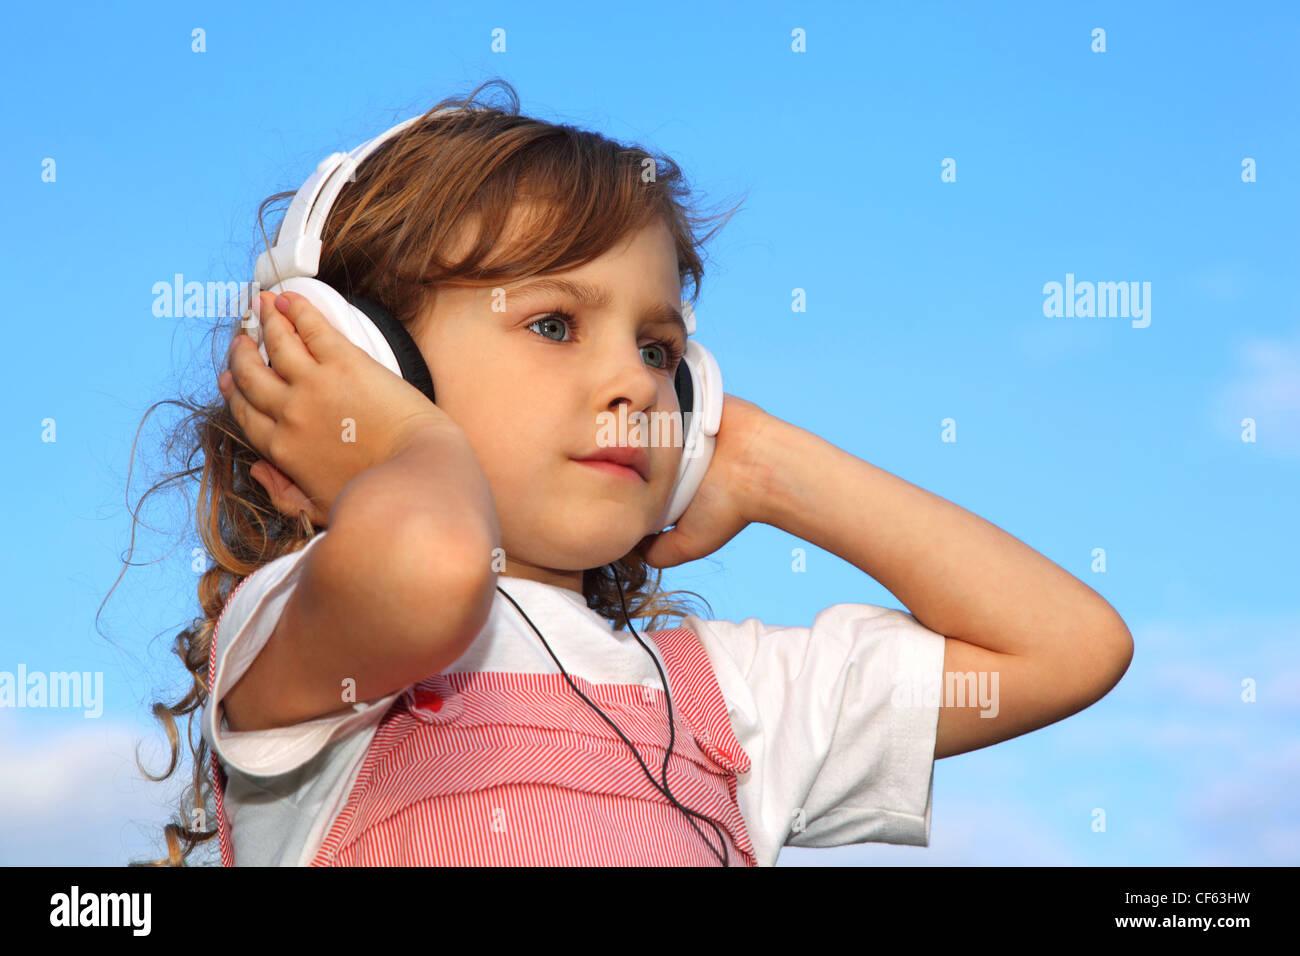 The lovely little girl, against the blue sky, listens to music through ear-phones. - Stock Image